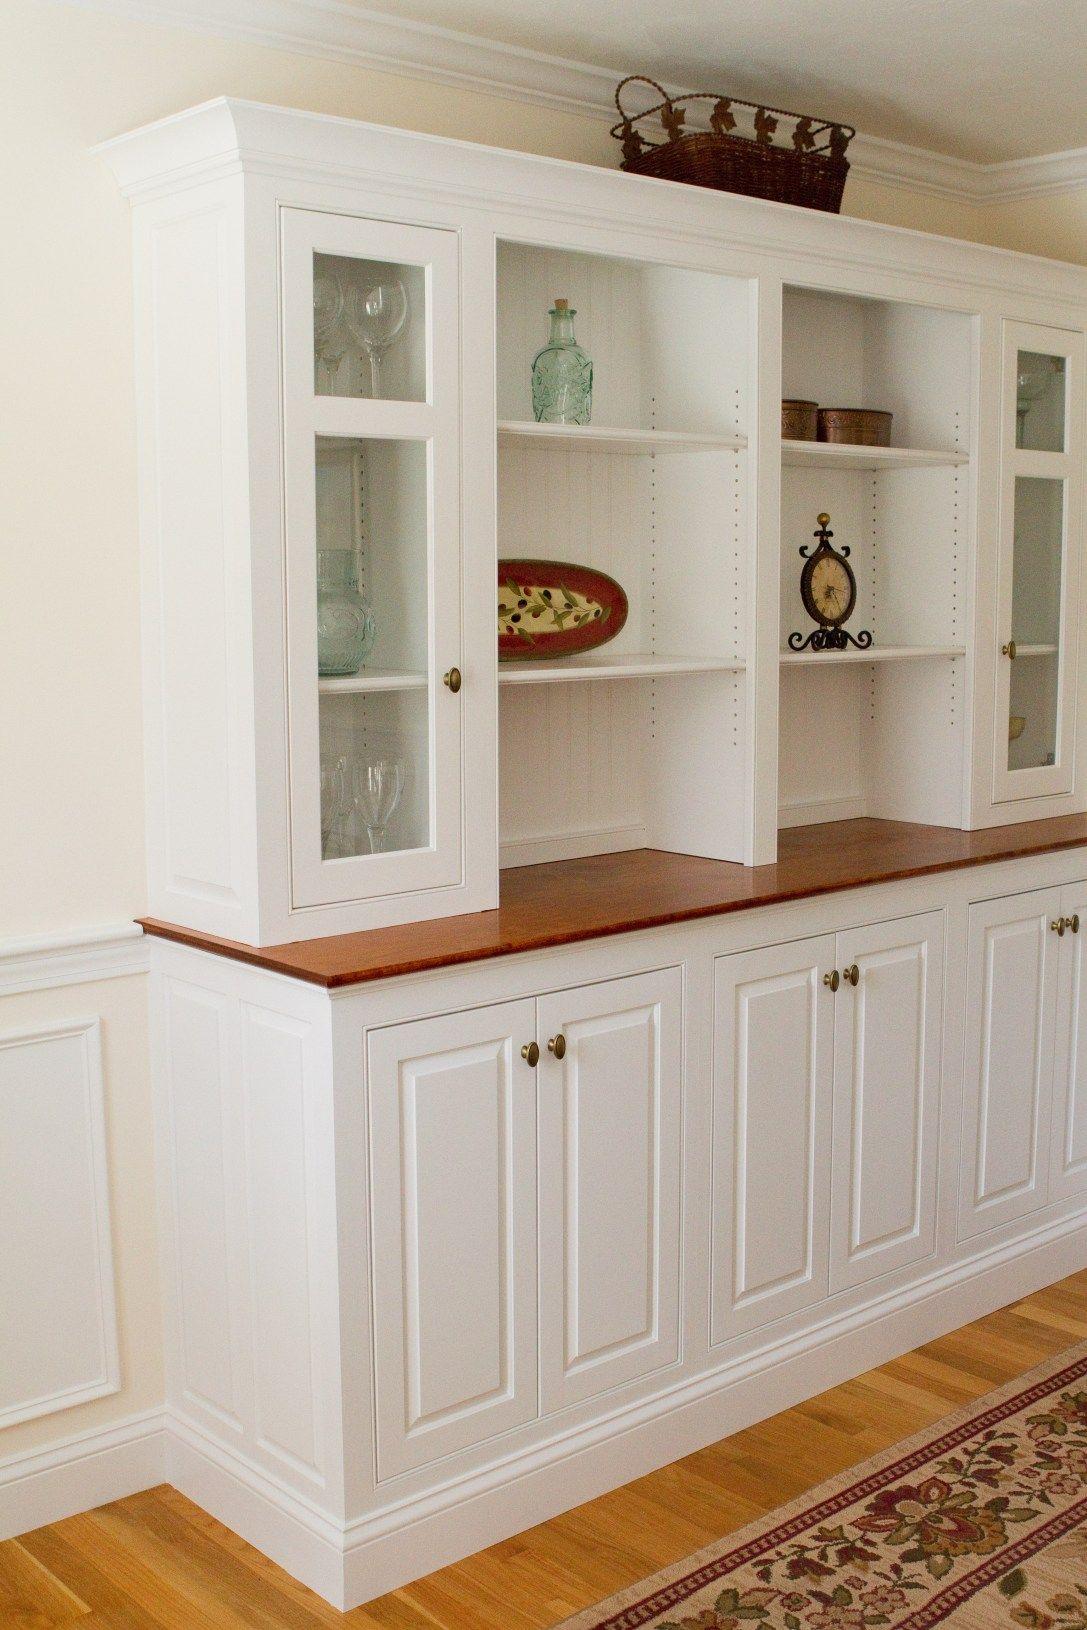 Dining Room Cabinet Cabinets Wikipedia4u